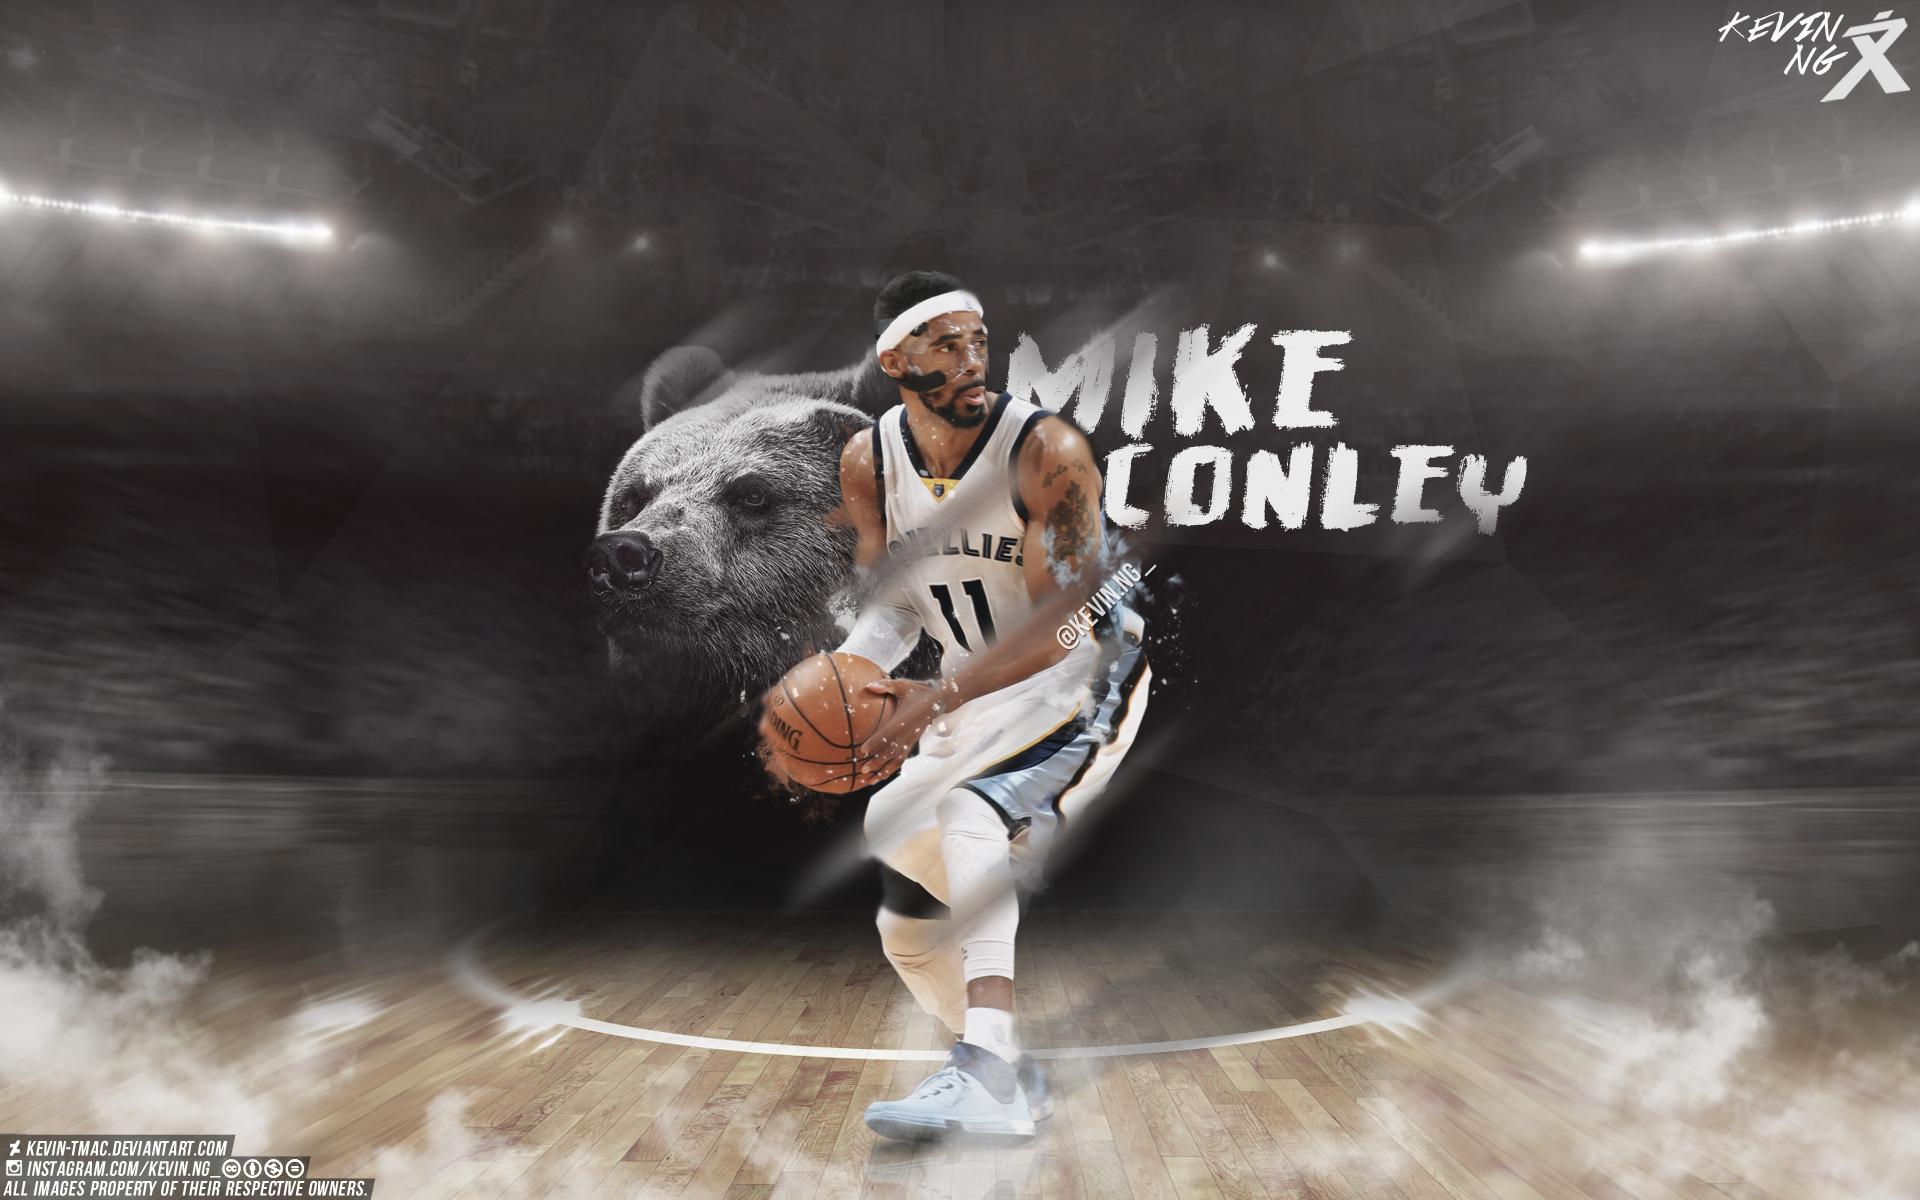 Best 49 Mike Conley Wallpaper on HipWallpaper Magic Mike 1920x1200